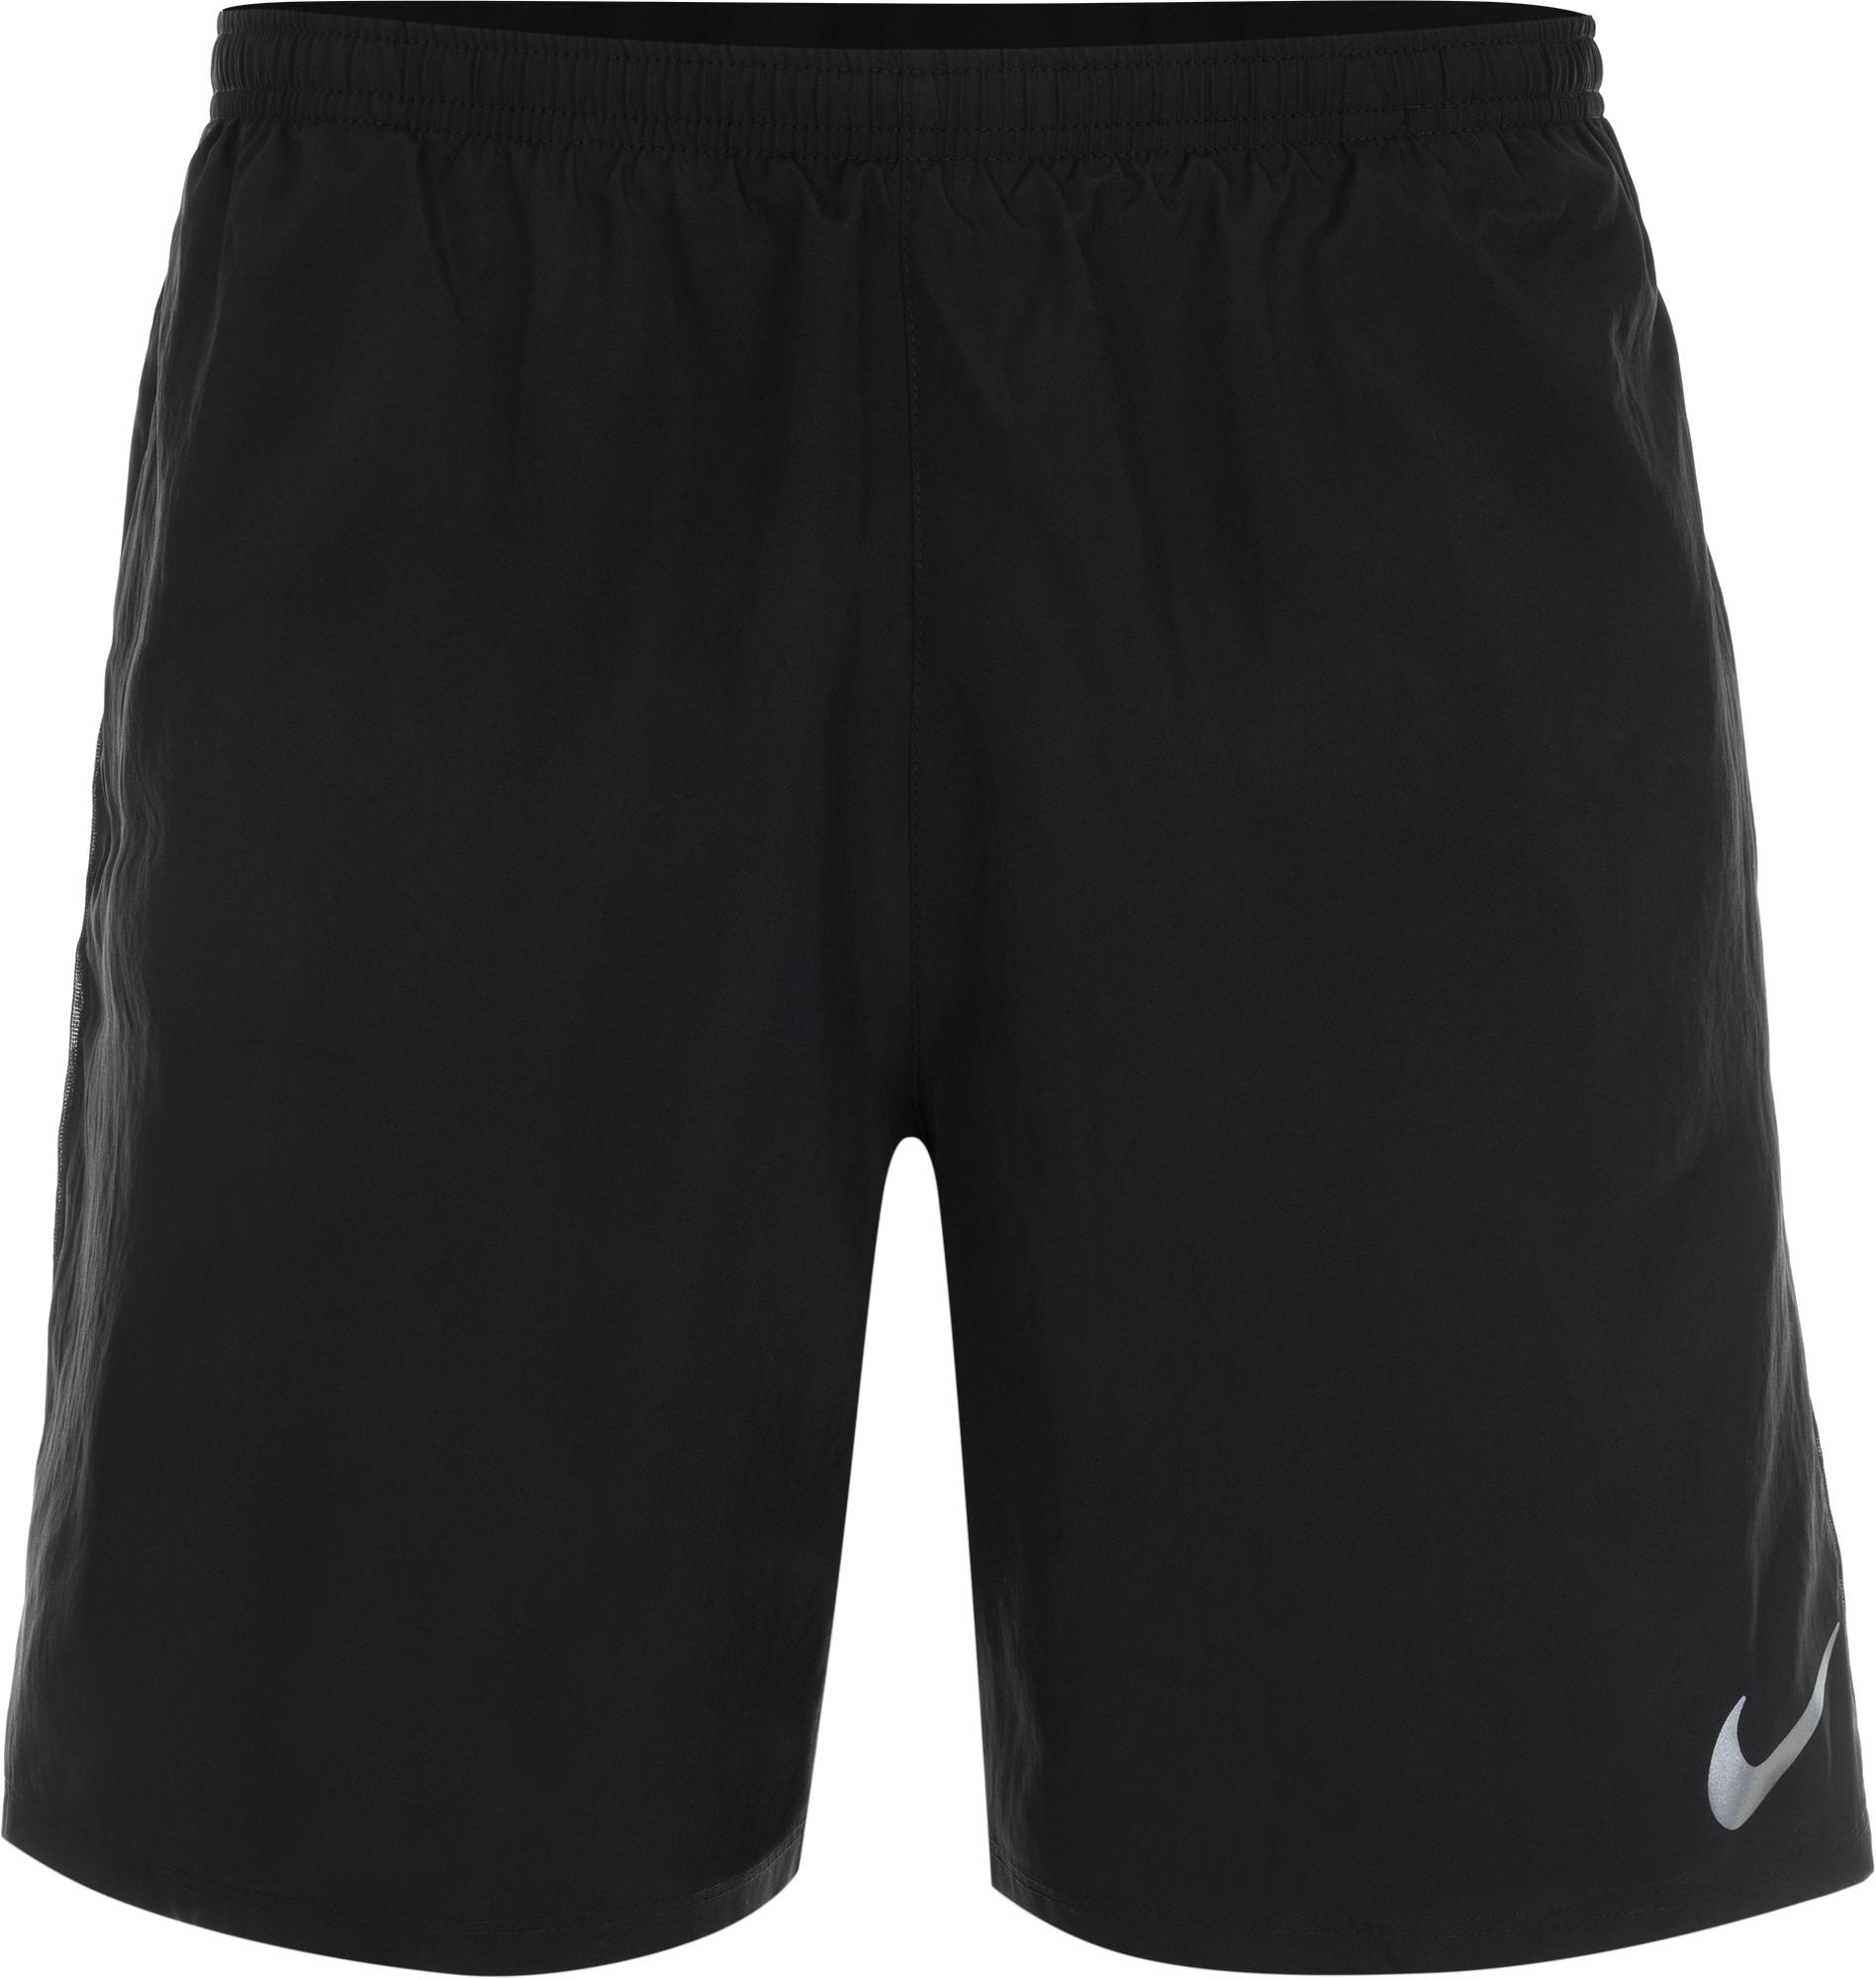 цена Nike Шорты мужские Nike, размер 54-56 онлайн в 2017 году